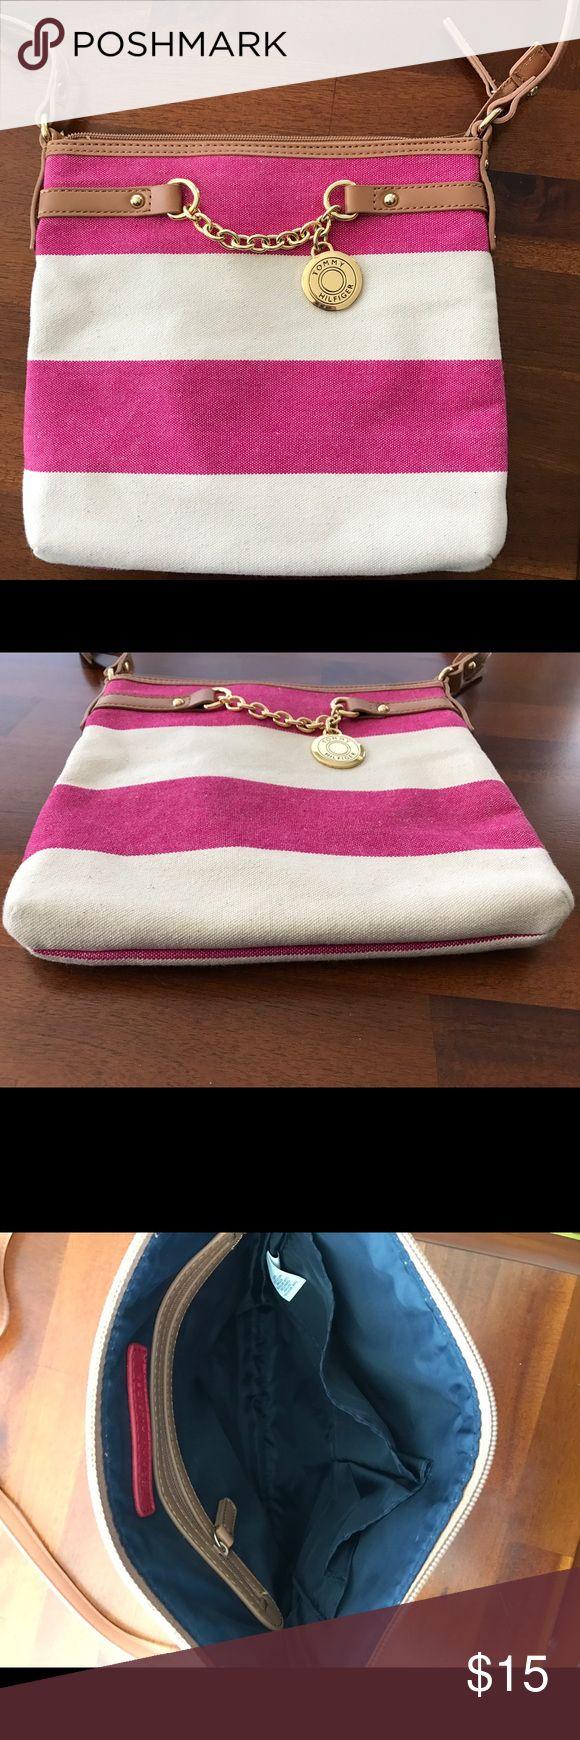 Selling this Tommy Hilfiger Canvas Handbag on Poshmark! My username is: kristeemarc. #shopmycloset #poshmark #fashion #shopping #style #forsale #Tommy Hilfiger #Handbags